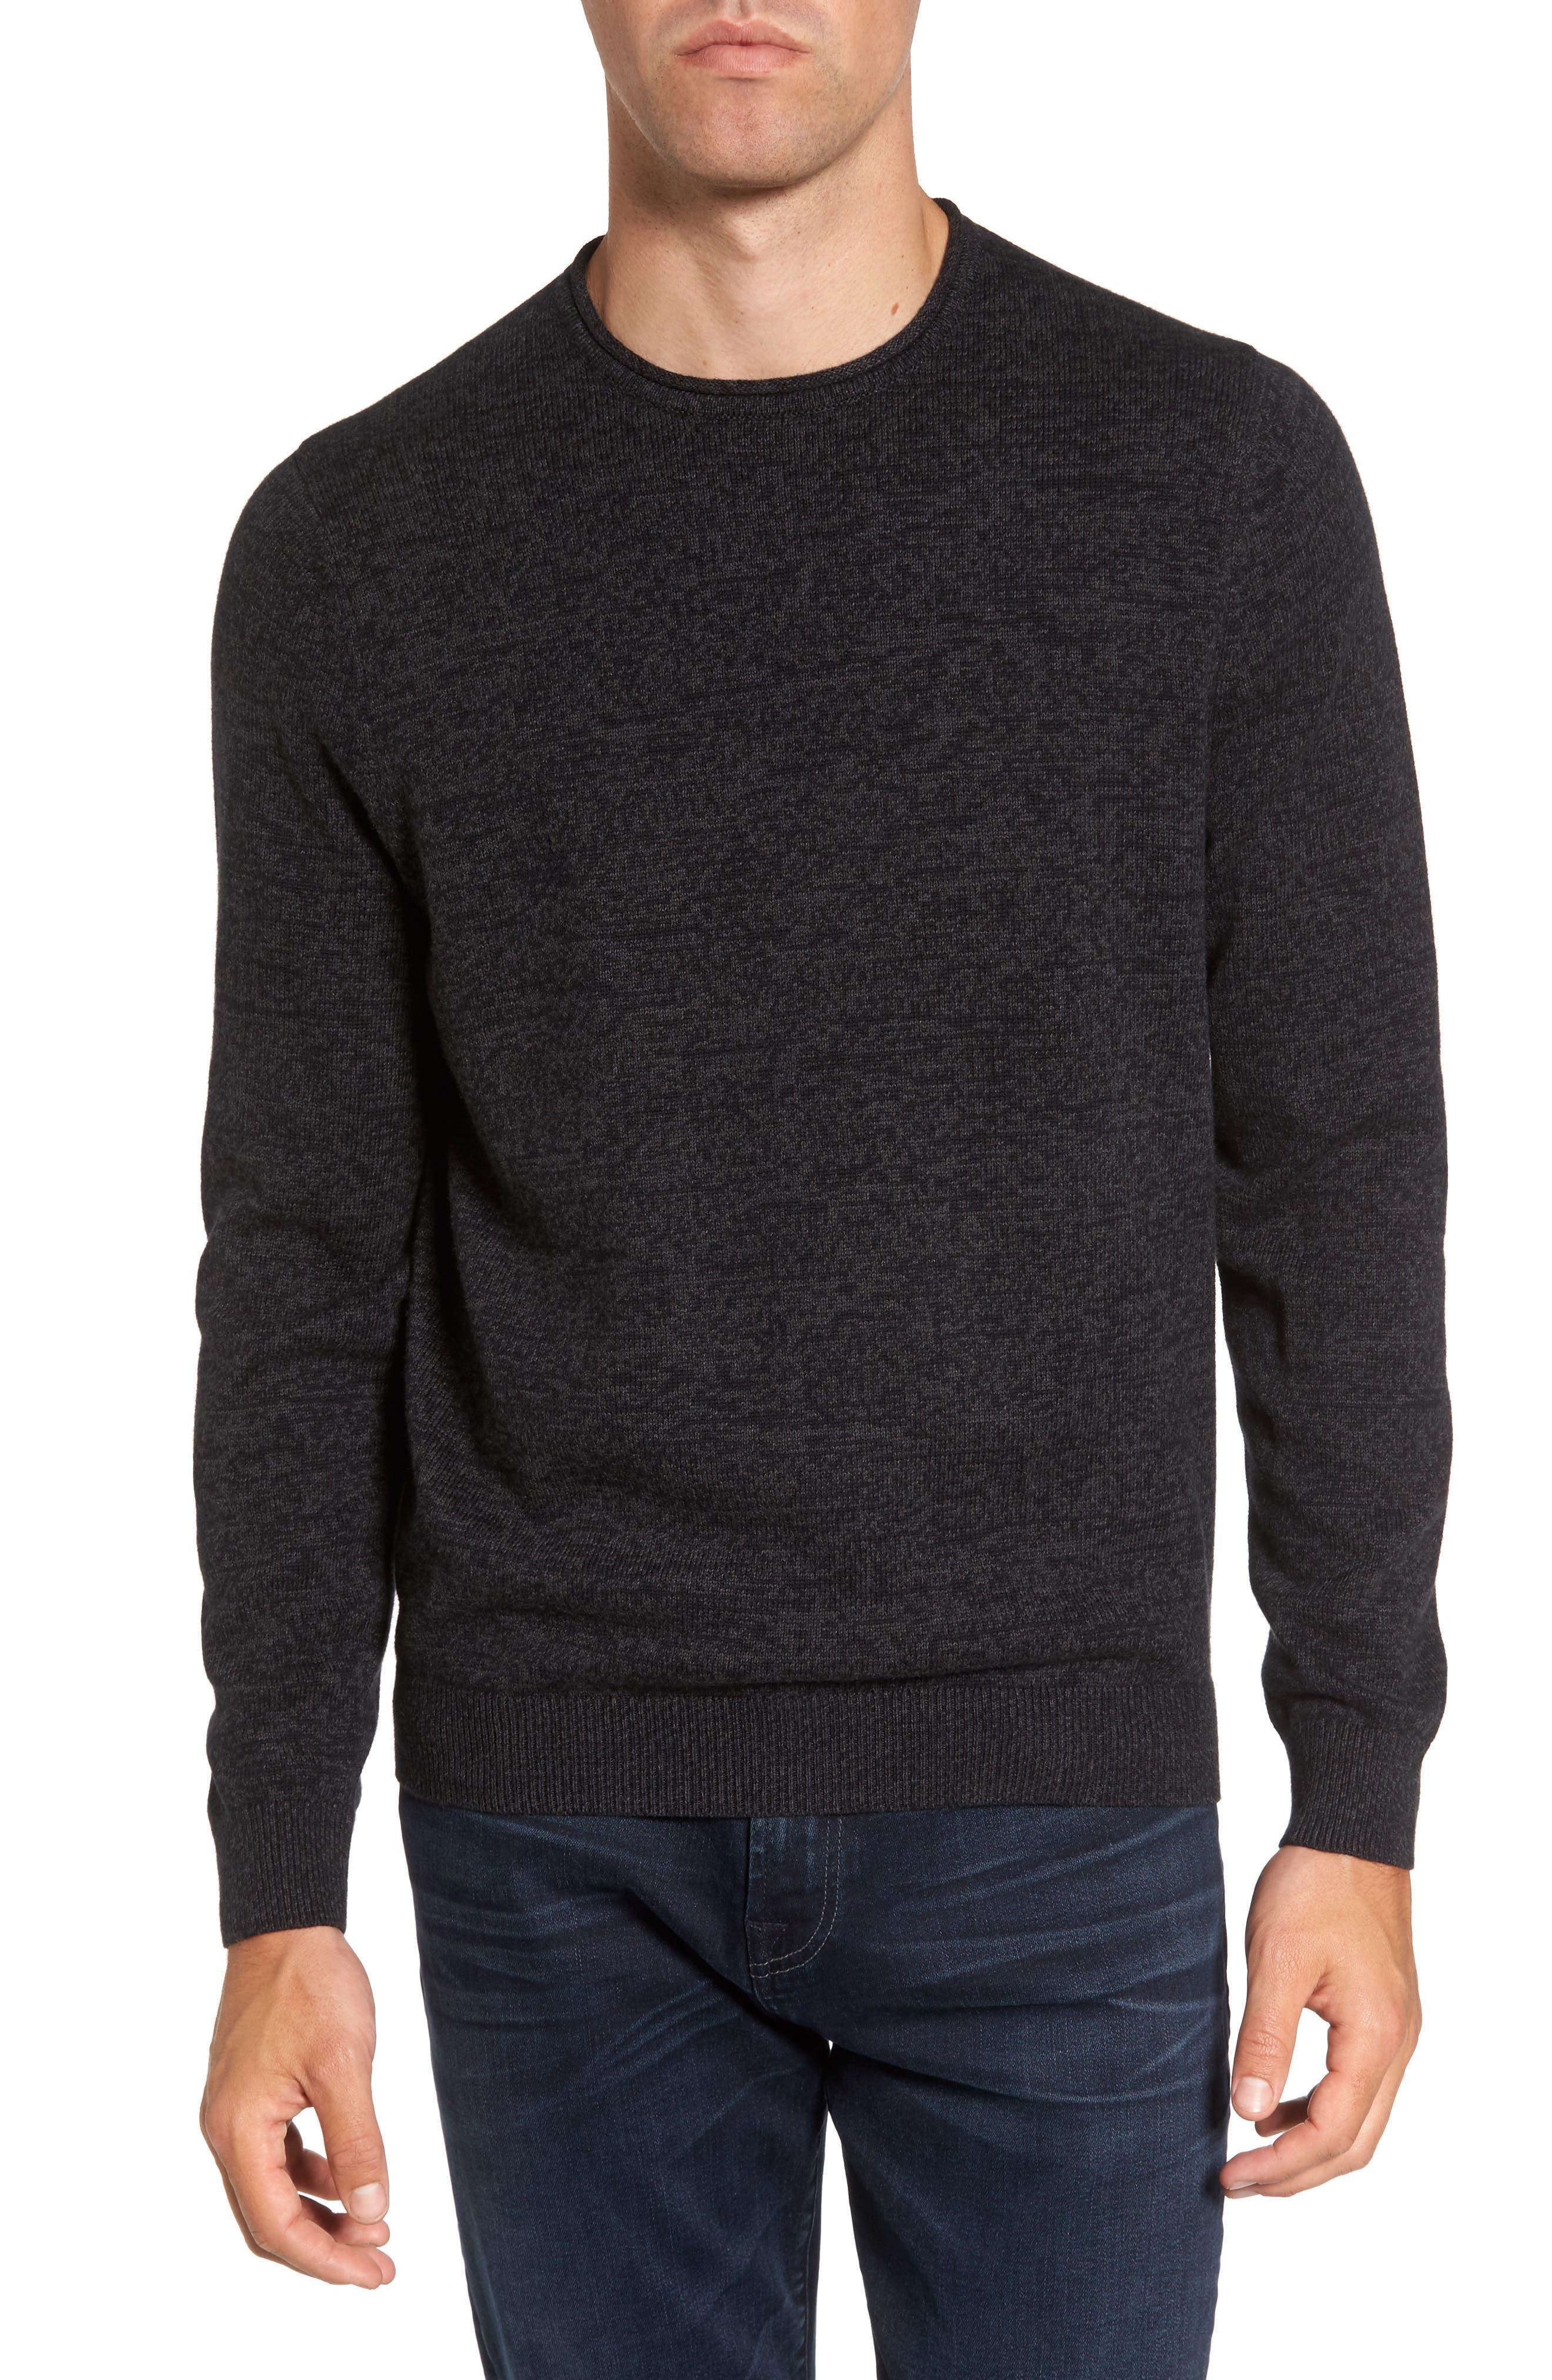 Cotton & Cashmere Roll Neck Sweater,                             Main thumbnail 1, color,                             021